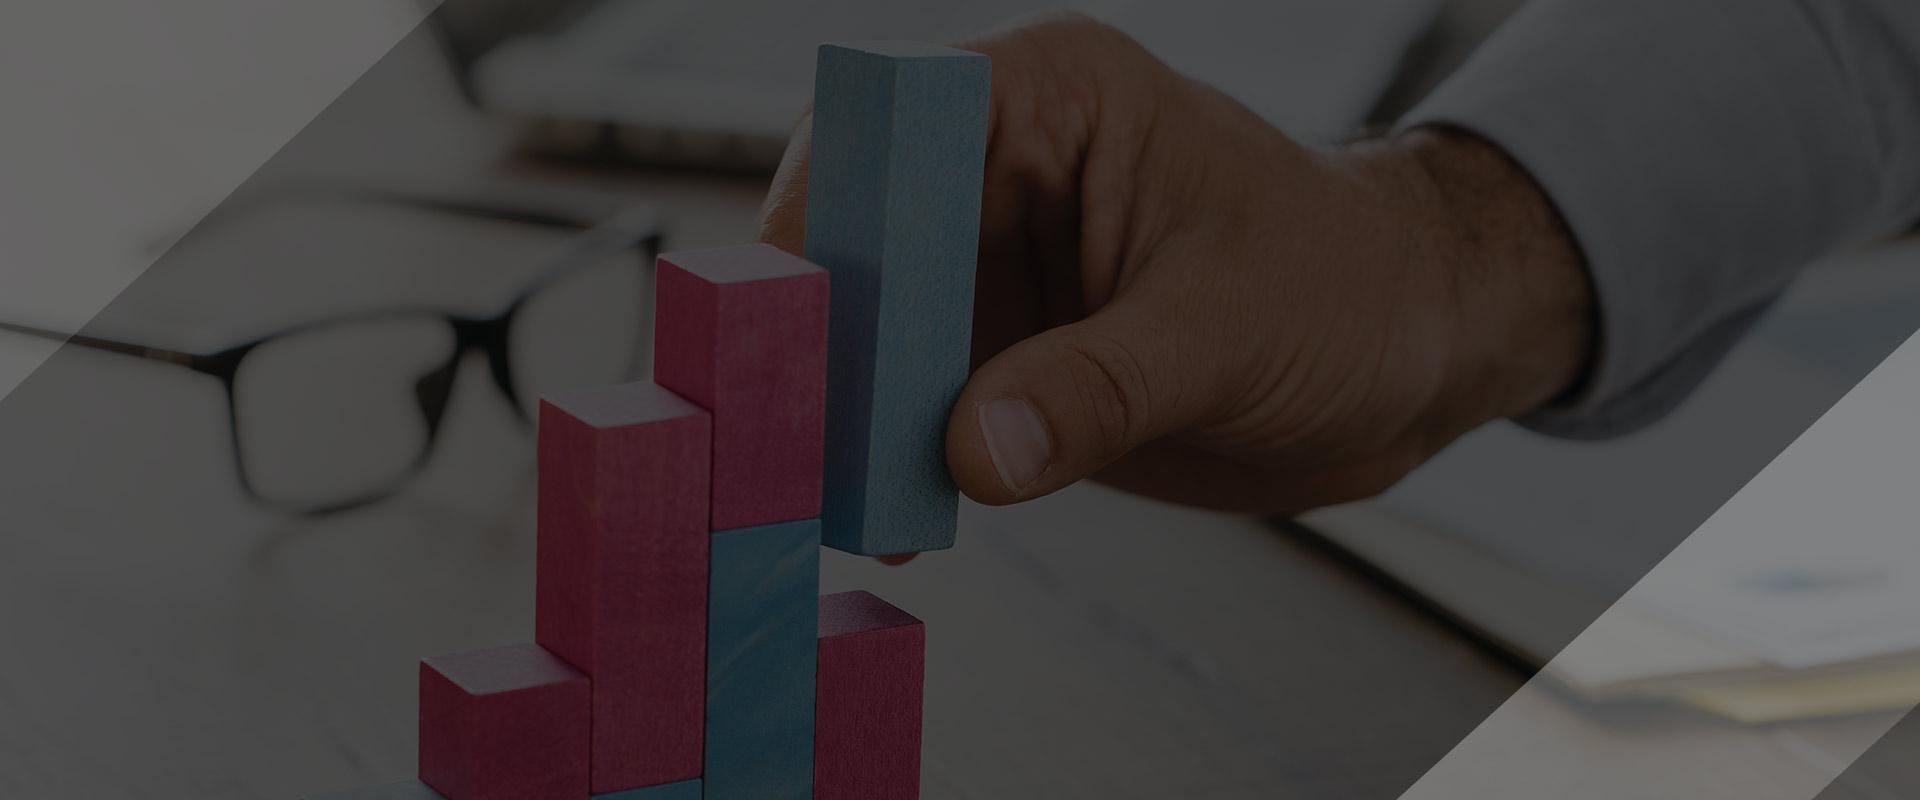 Accounting building blocks